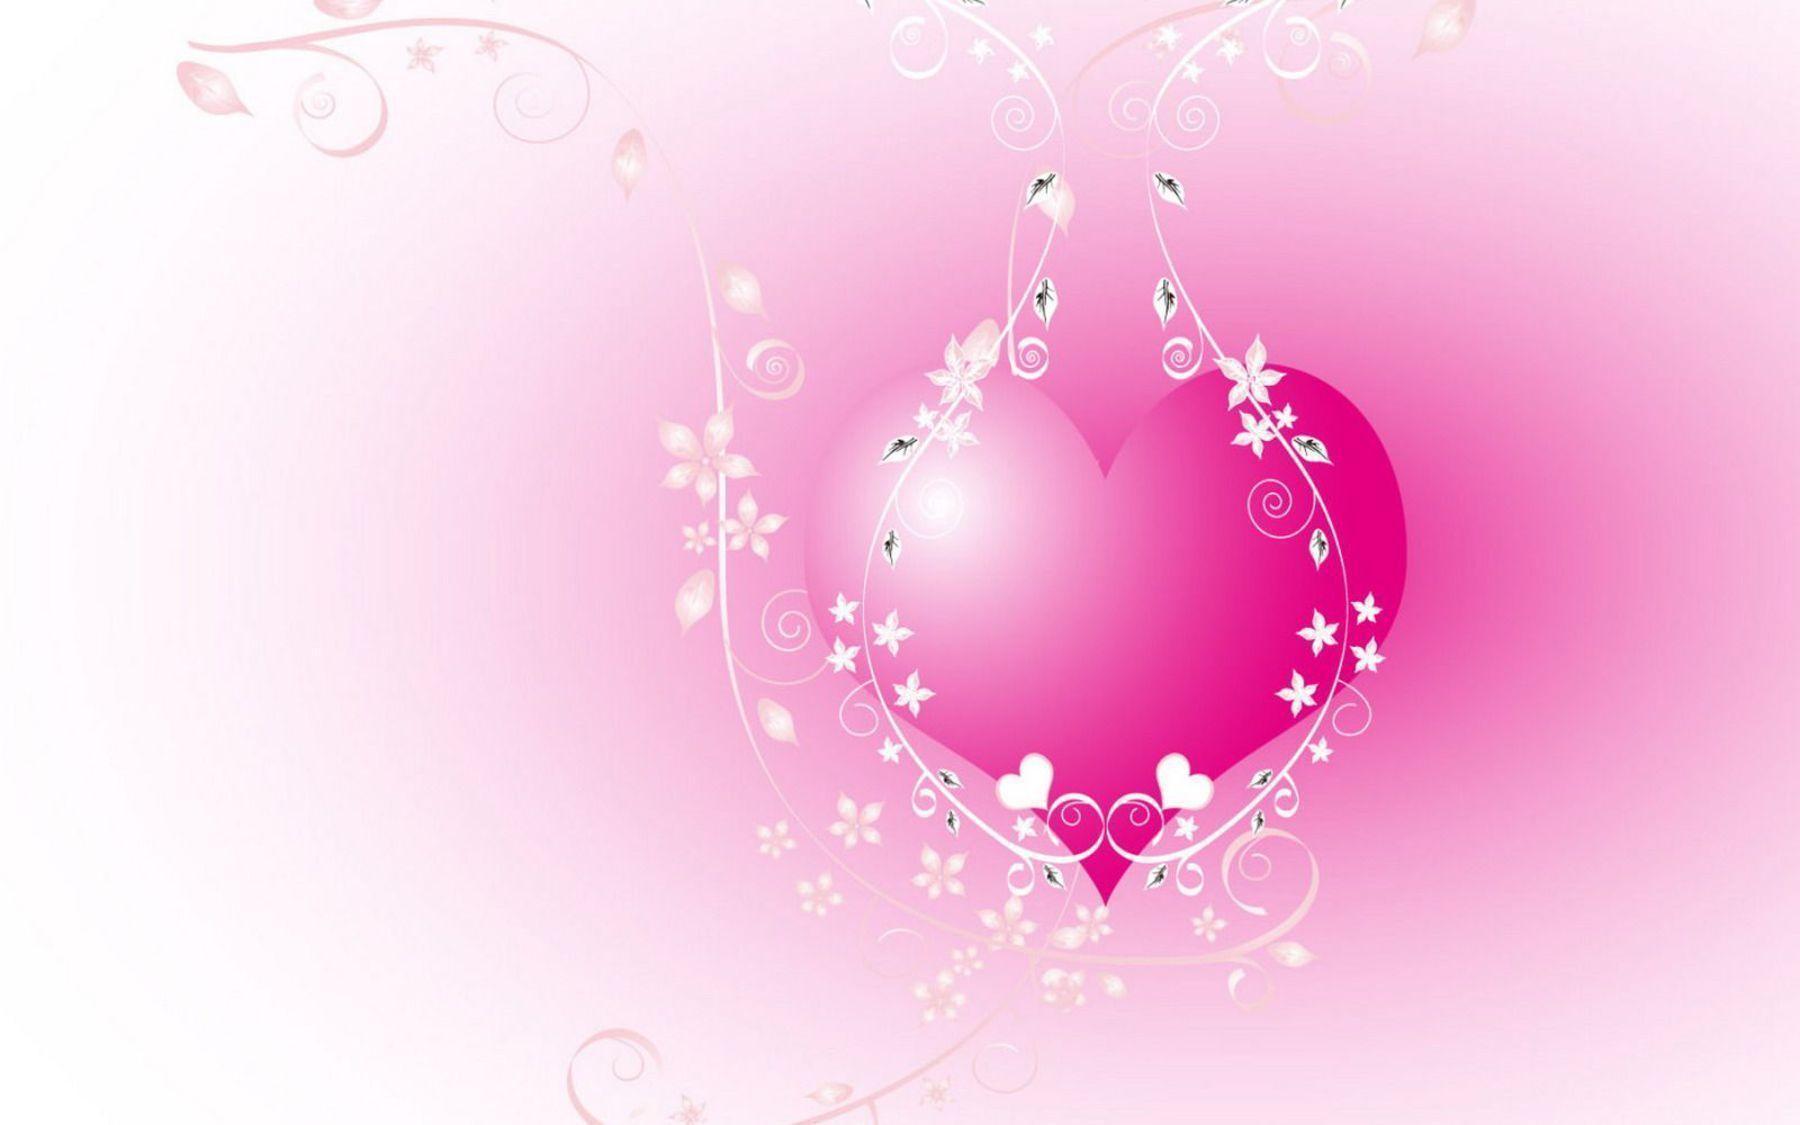 Valentine Desktop Wallpapers Free - Wallpaper Cave